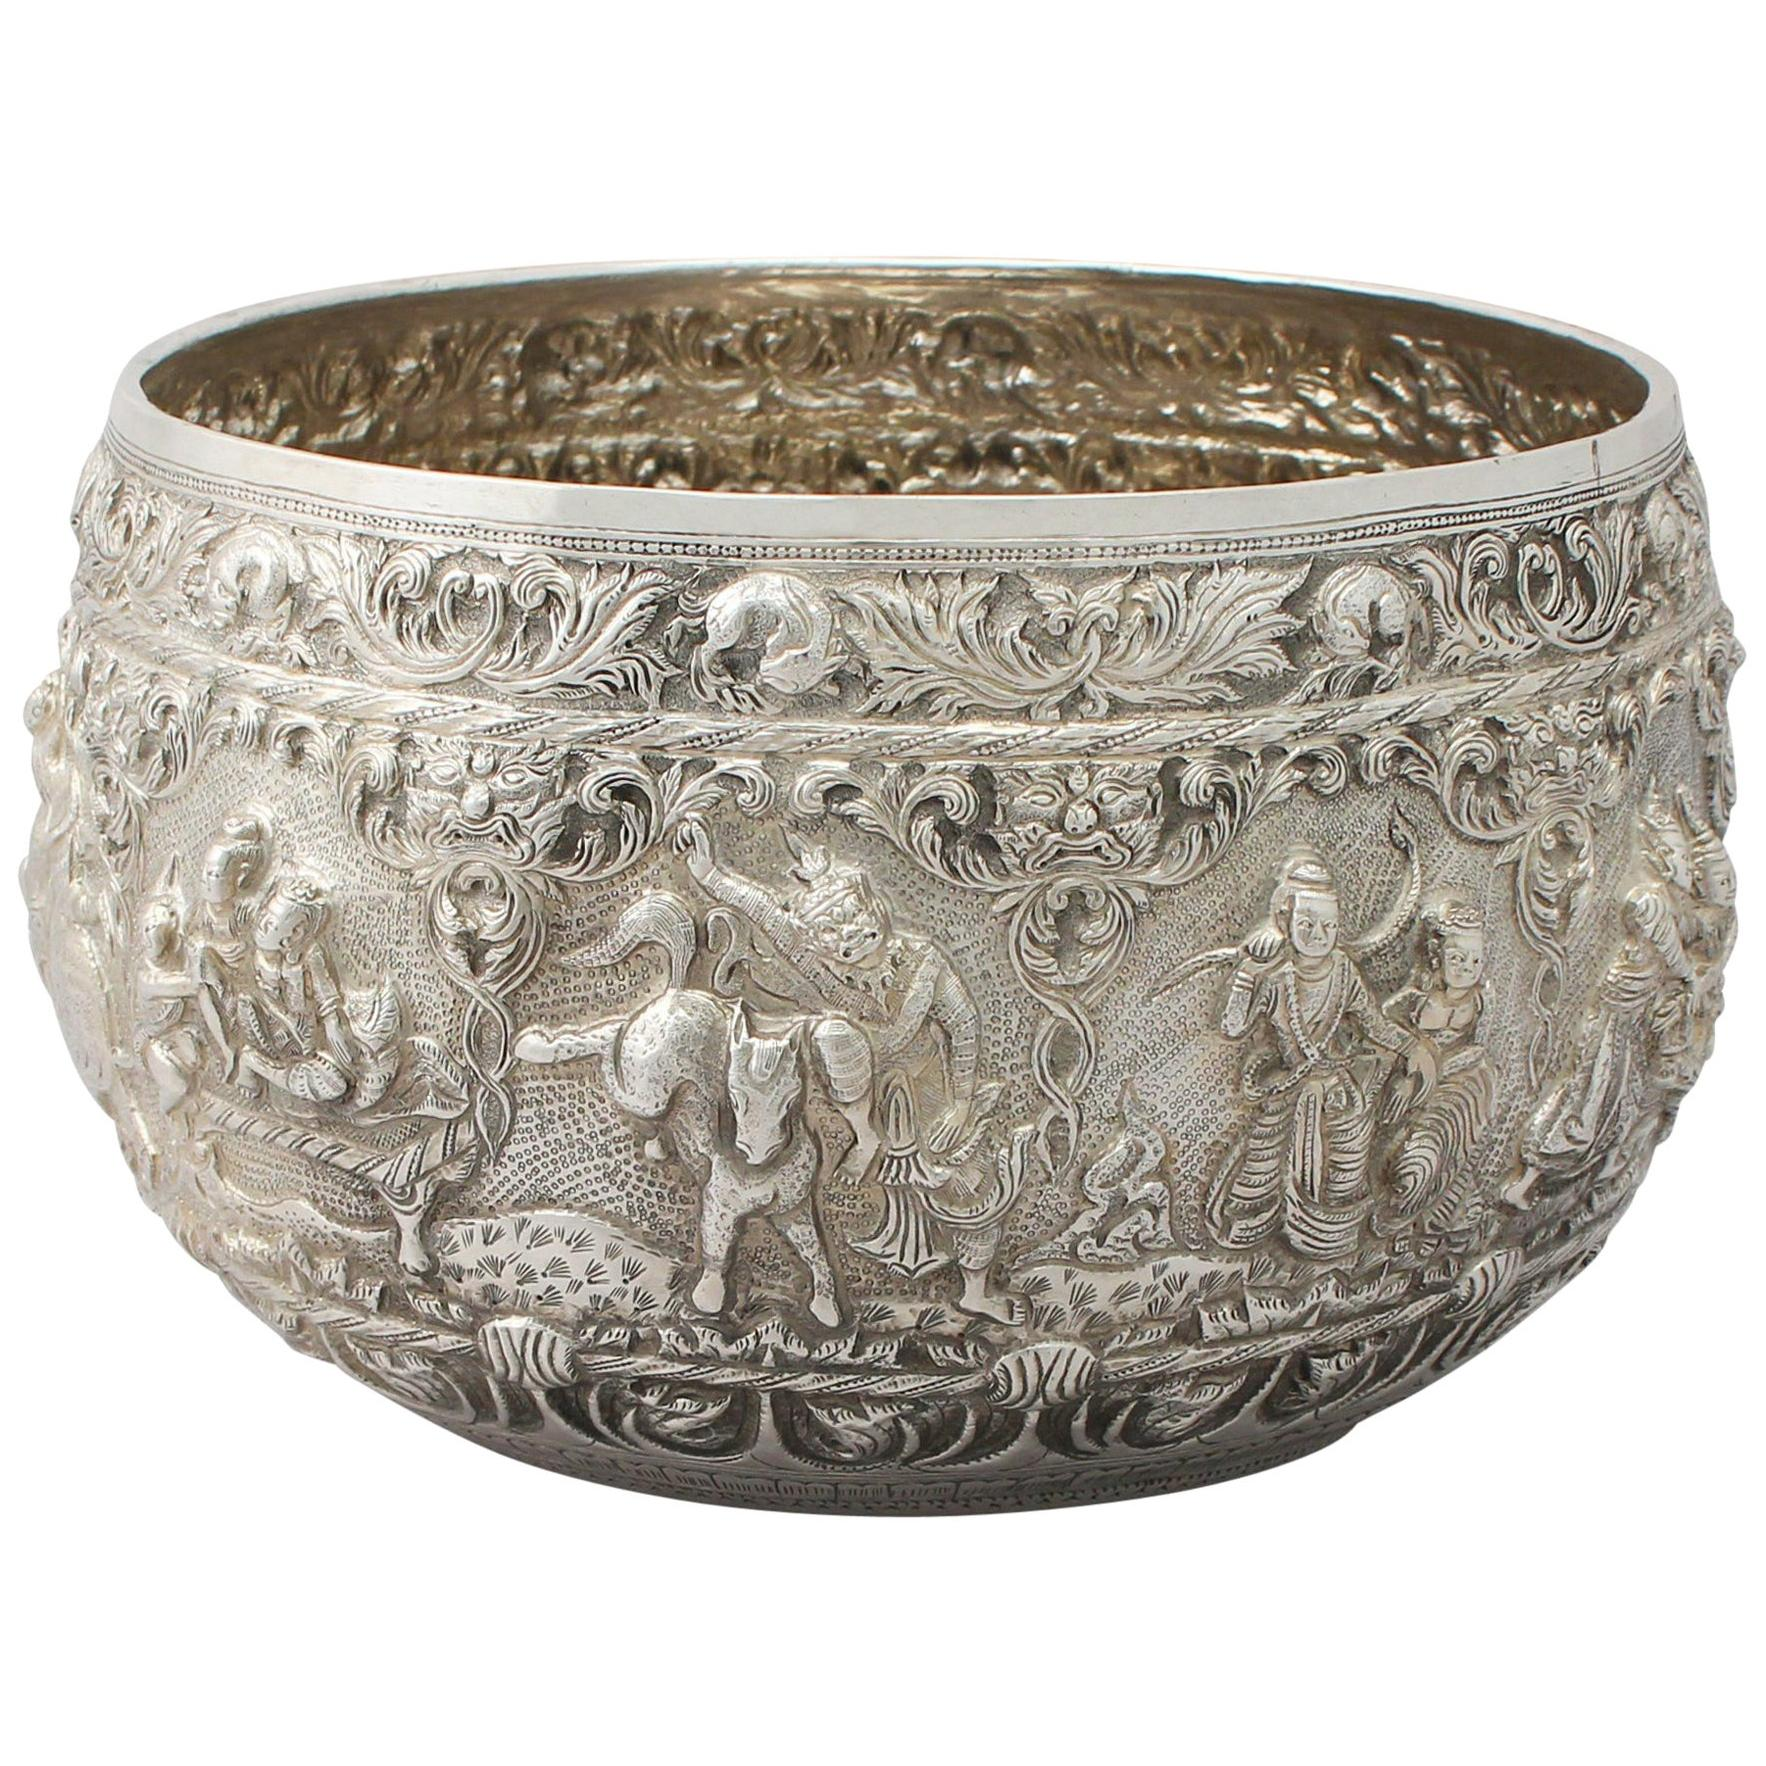 1880s Antique Burmese Silver Thabeik Bowl